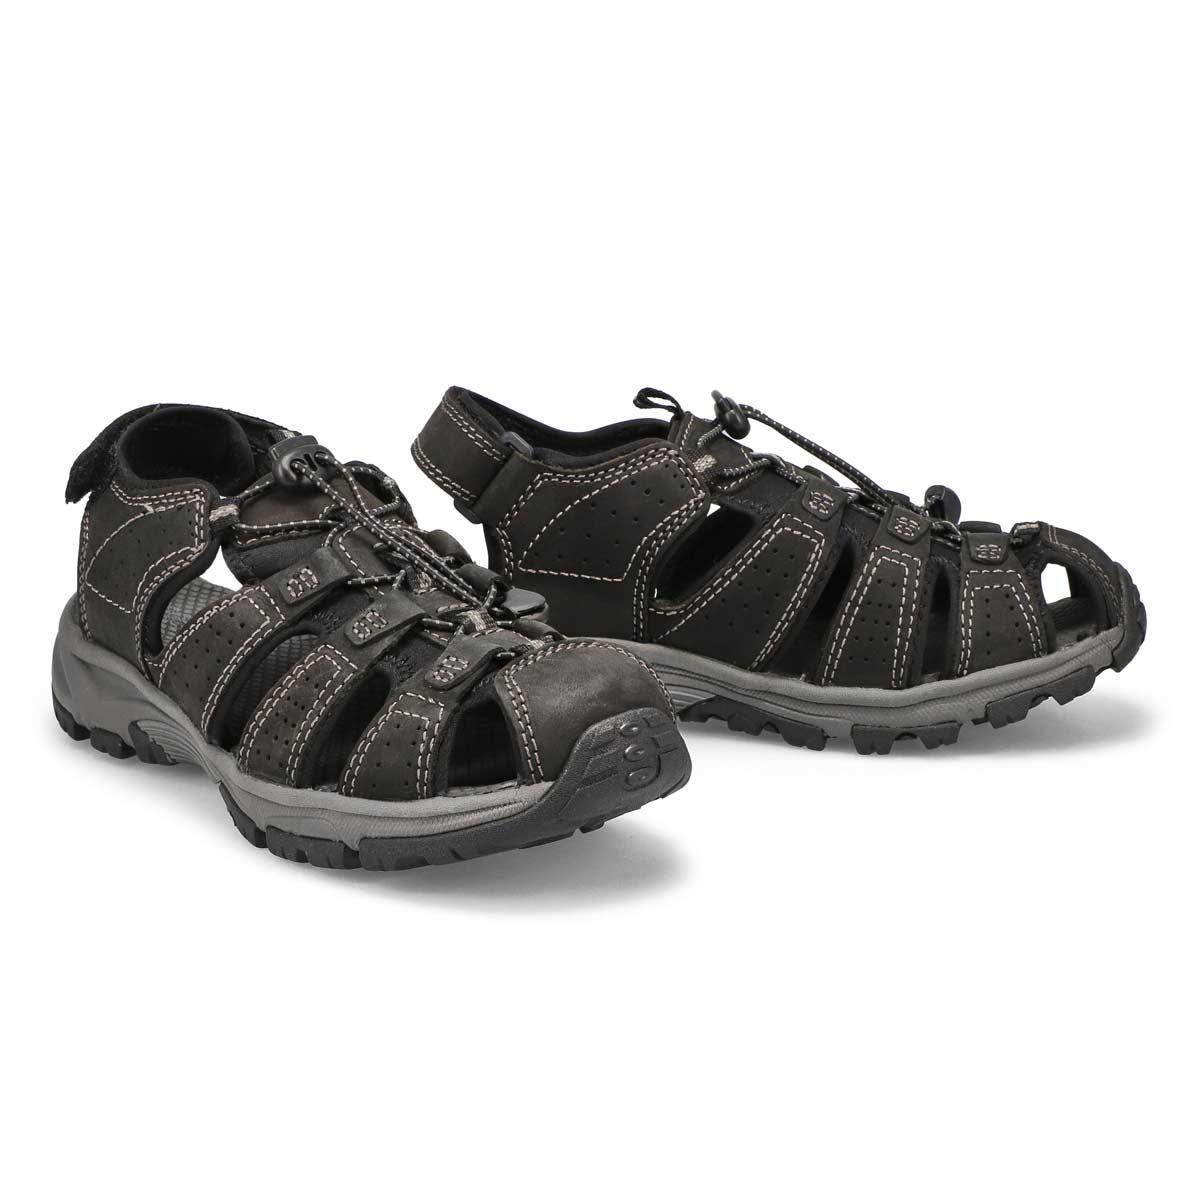 Mns Linus 2 black fisherman sandal